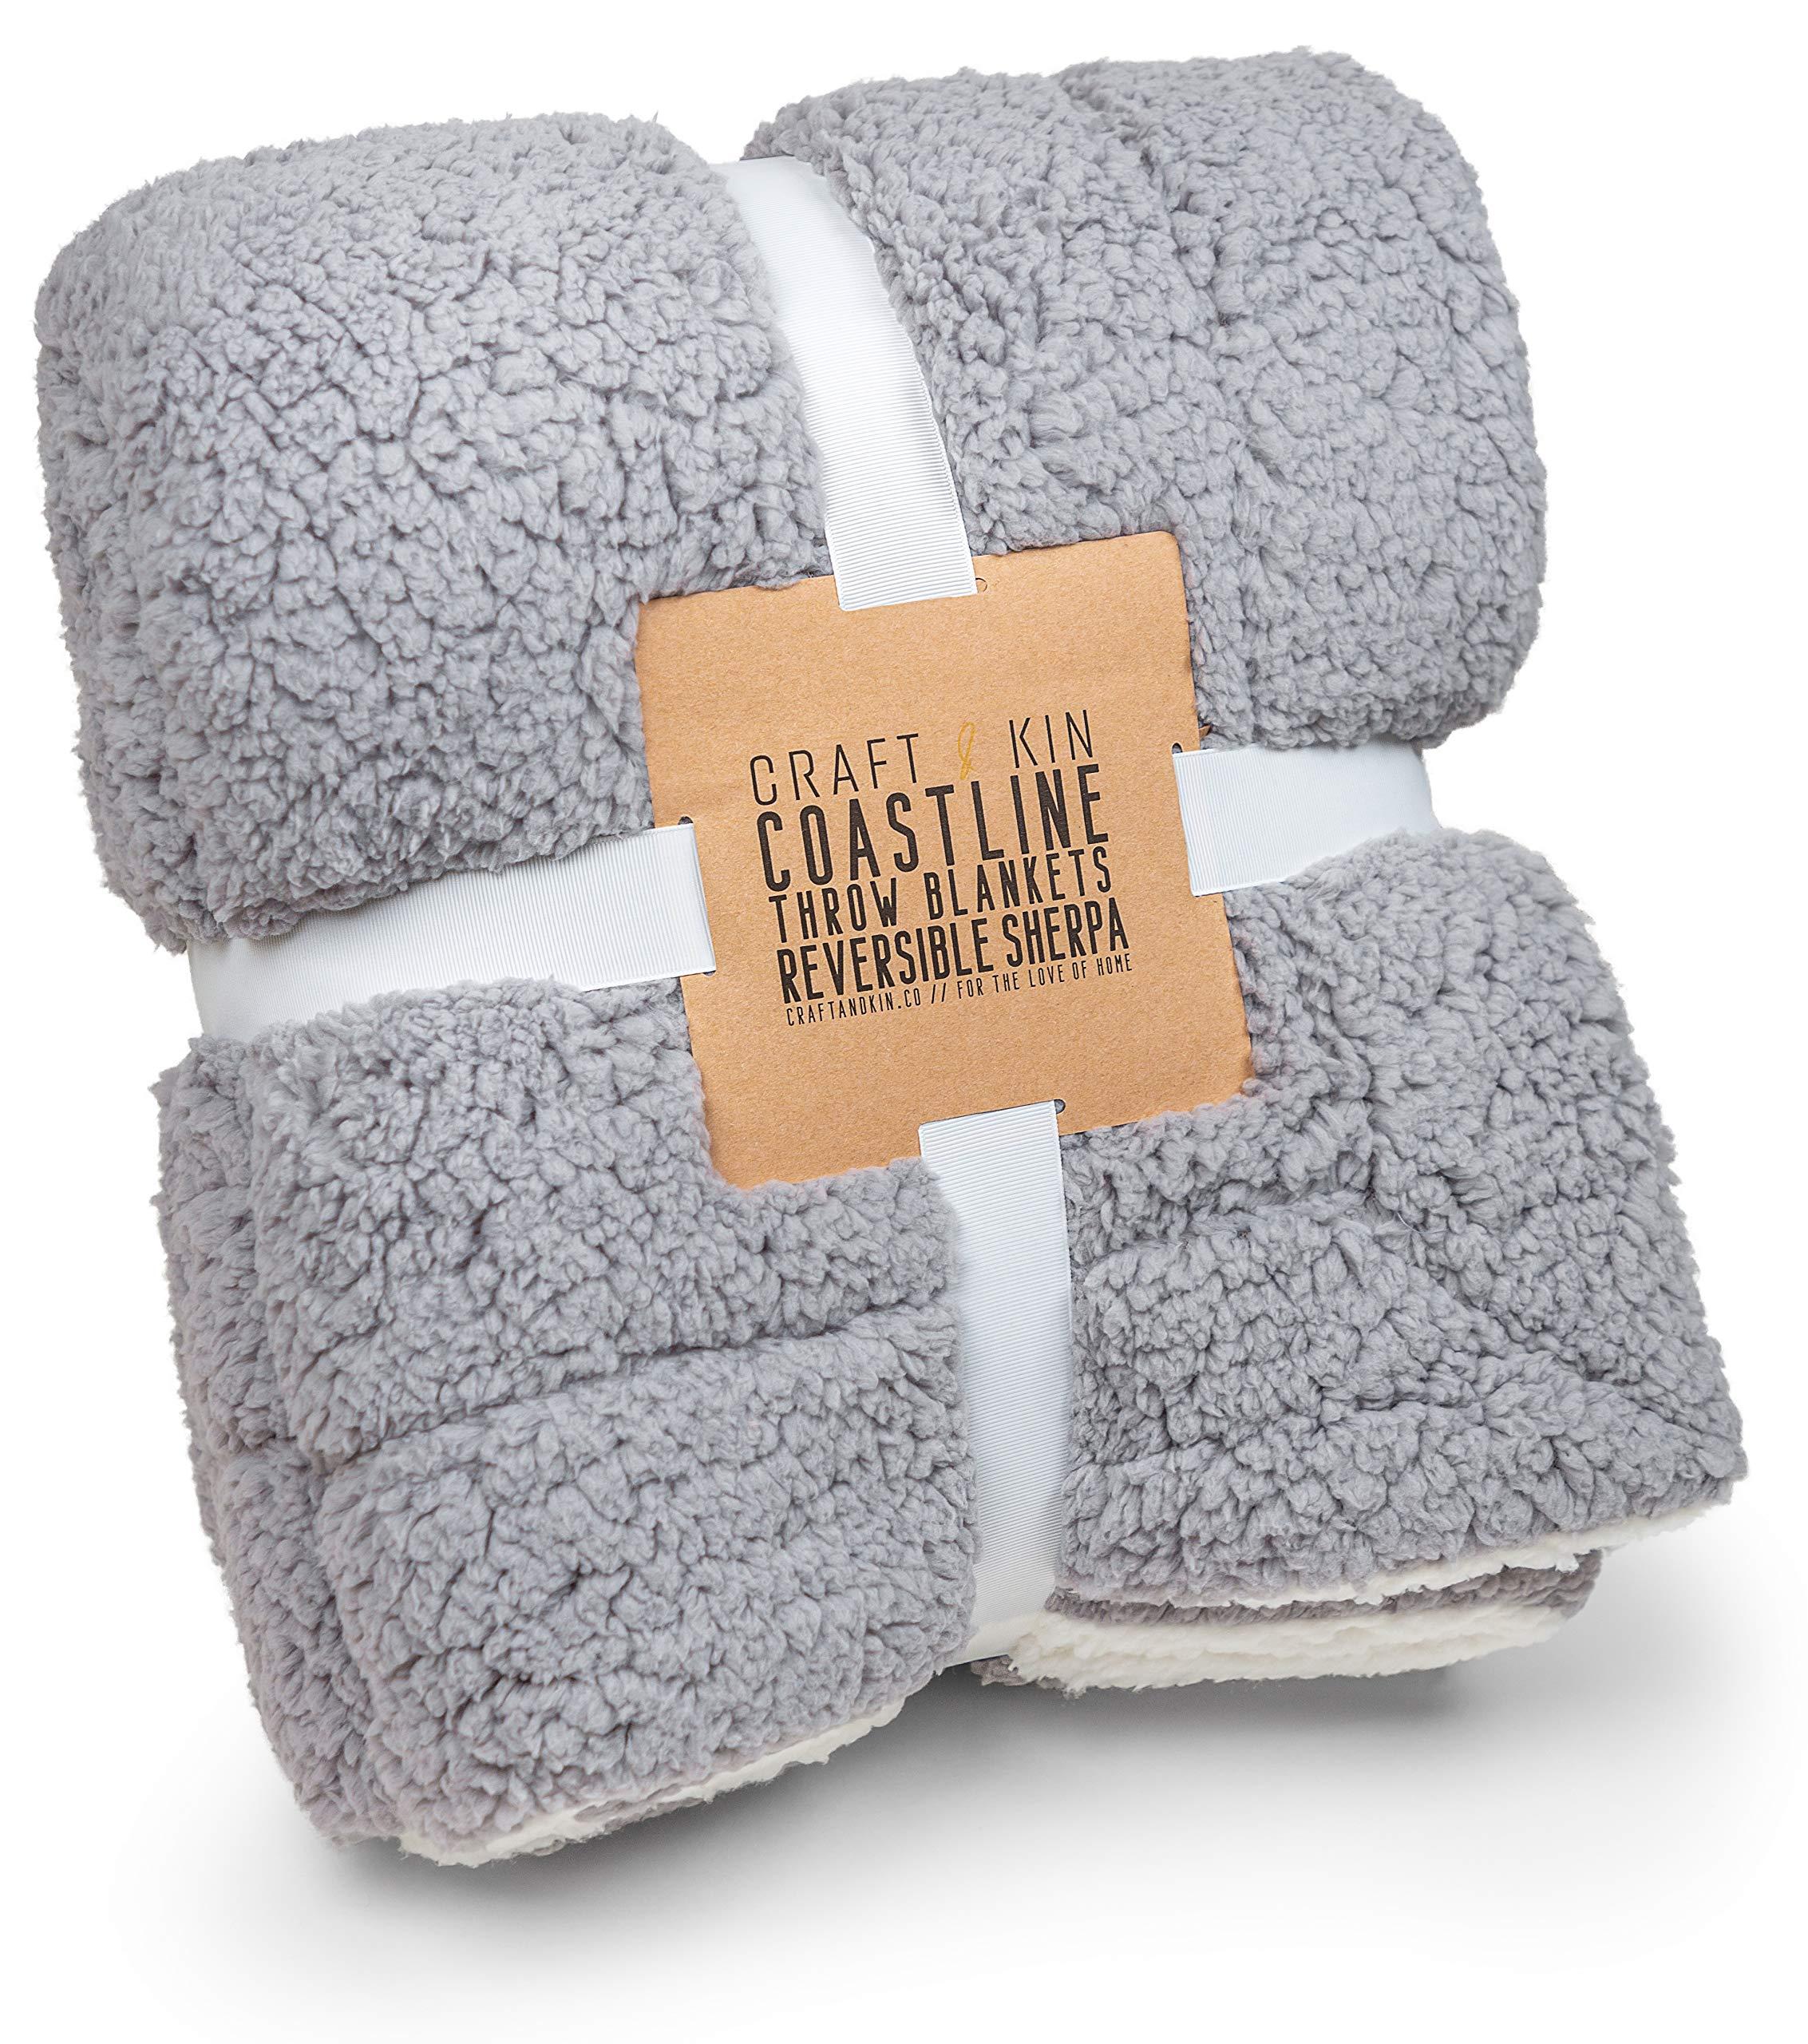 "Dual-Sided Charcoal Grey & White Fleece Throw Blanket, Premium Sherpa Blanket, Cozy Blanket, Fluffy Blanket, Thick Blanket, Soft Blanket, Fuzzy Blanket, Fleece Blanket Fabric (Full Size, 60.5"" x 48"")"